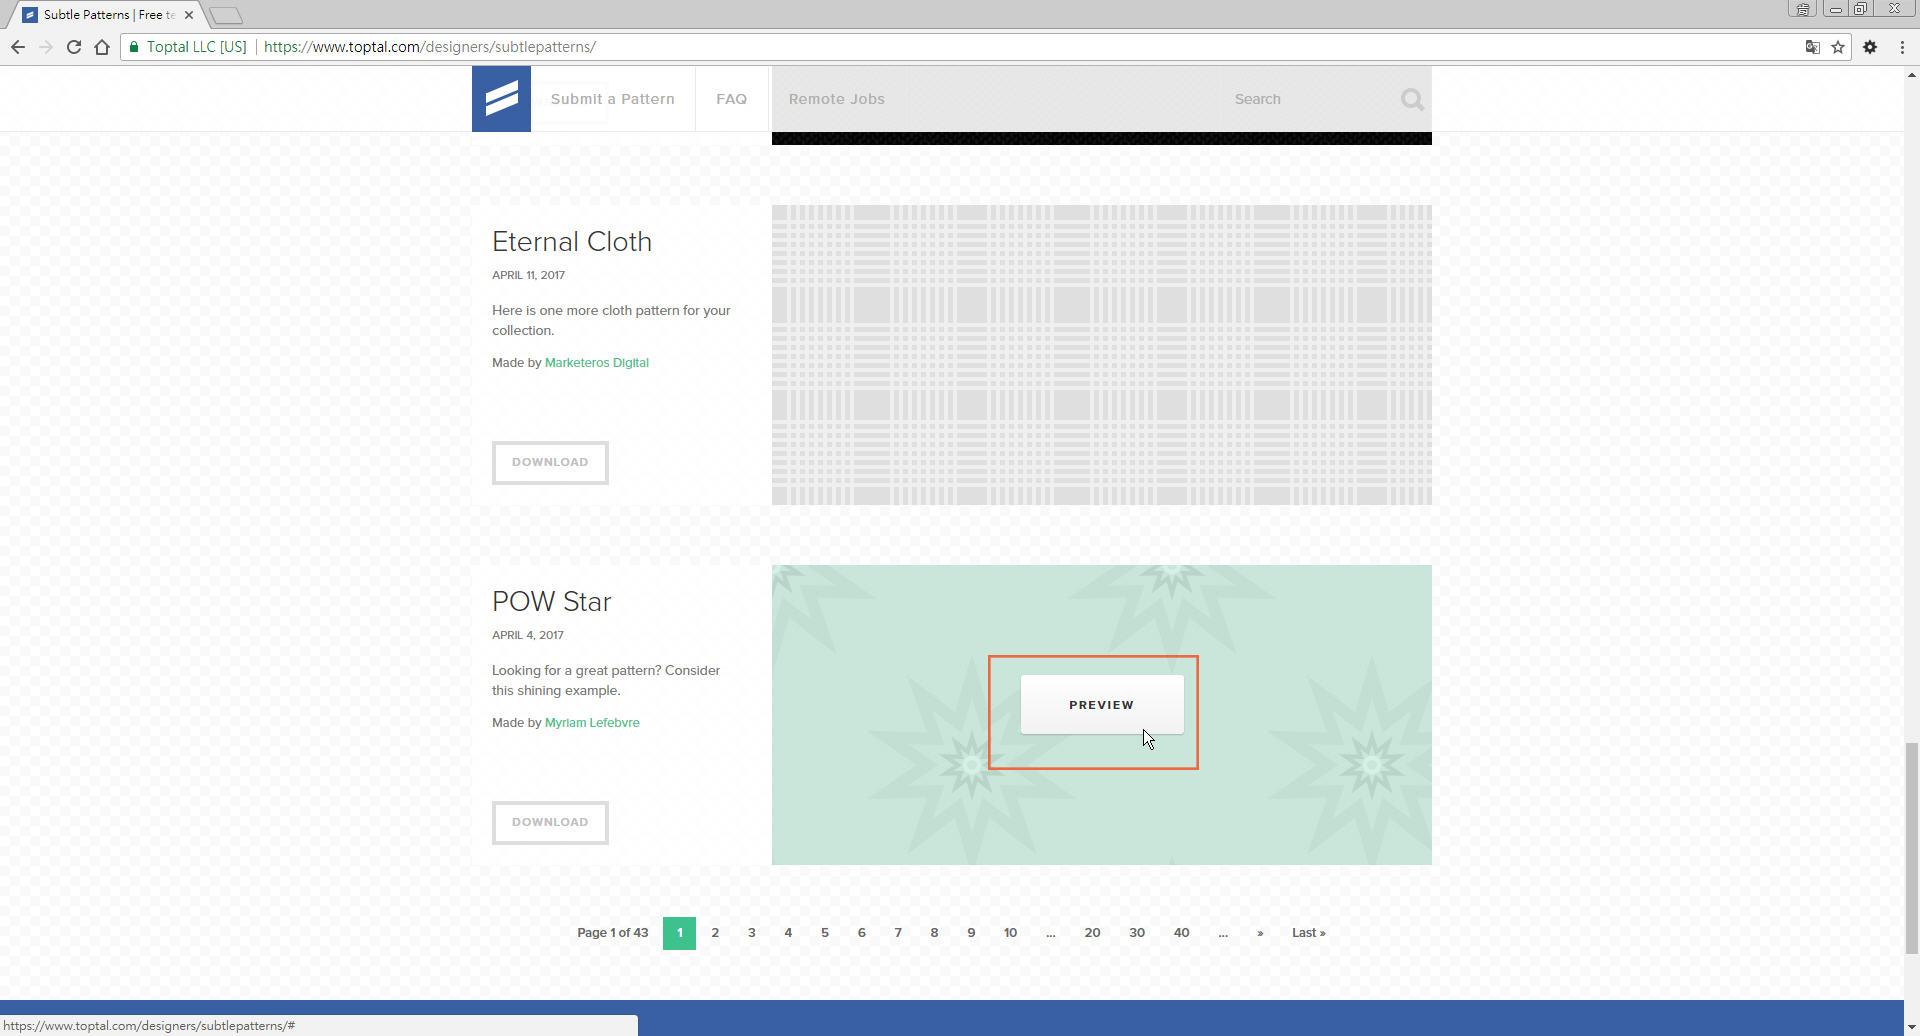 Free Resource 好康報報 Good Design 好站報報  - 【設計資源】Subtle Patterns - 免費下載之 pattern 素材網站 - p-2